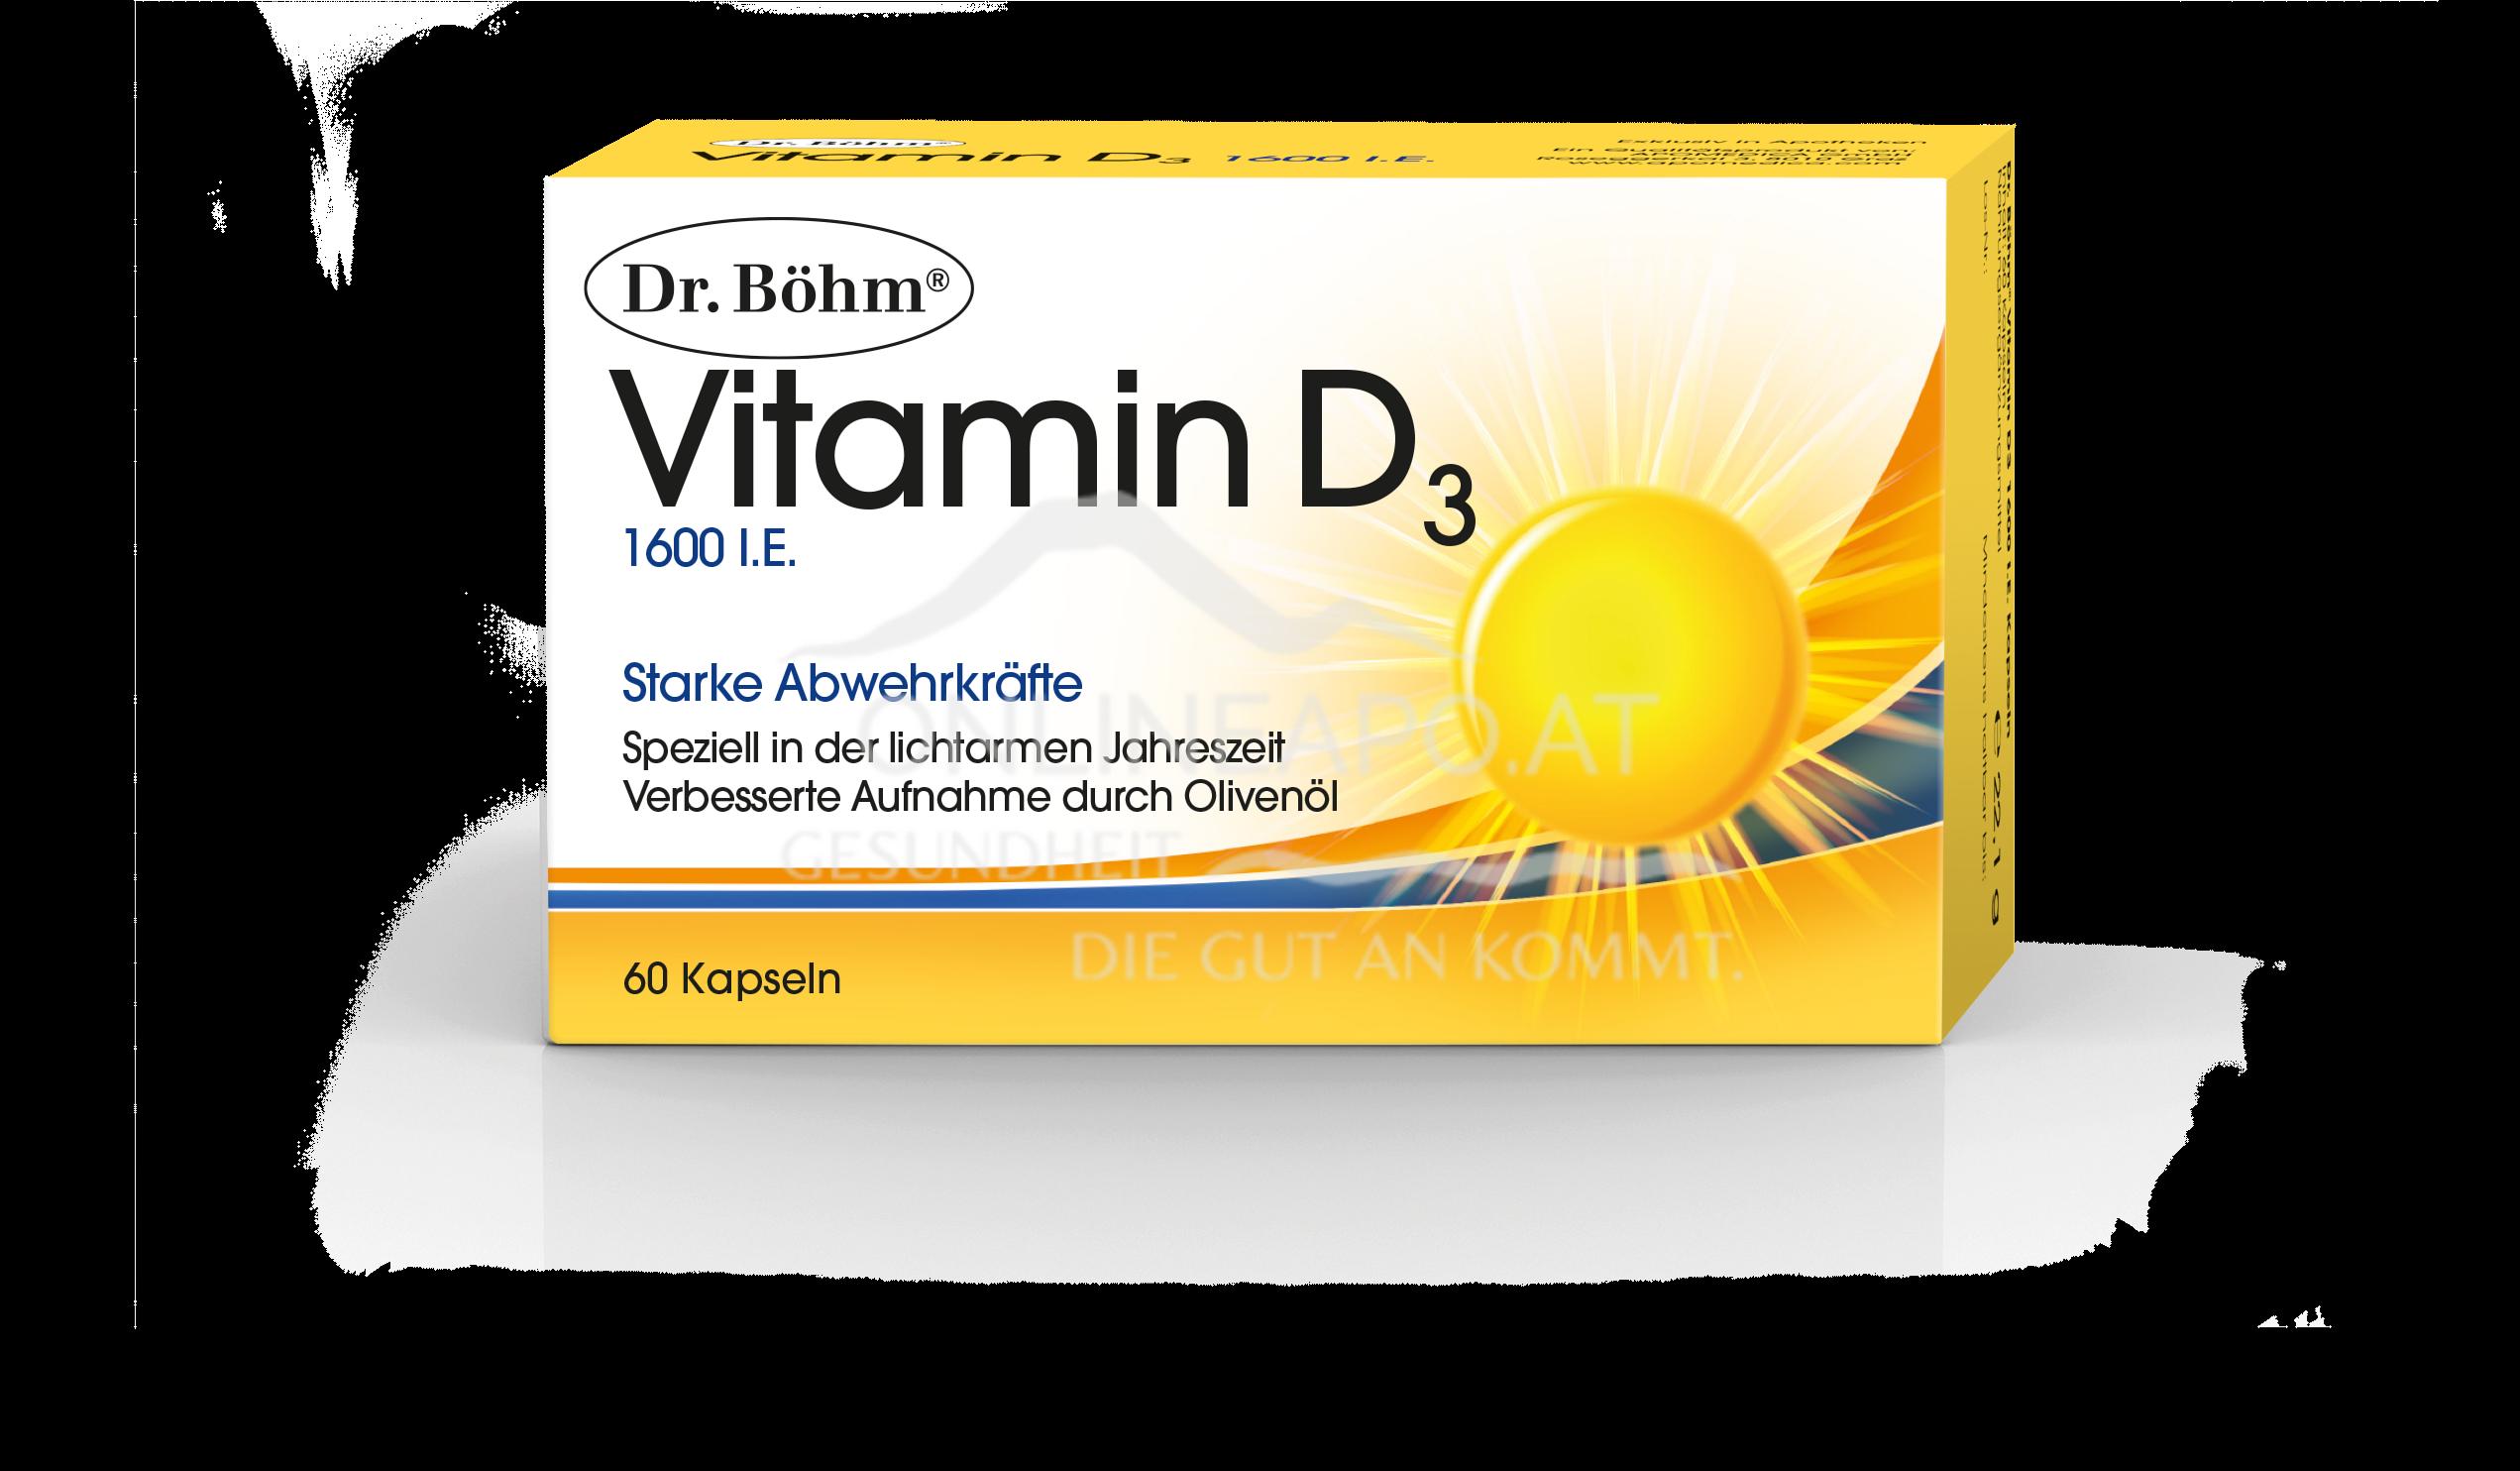 Dr. Böhm® Vitamin D3 1600 I.E.